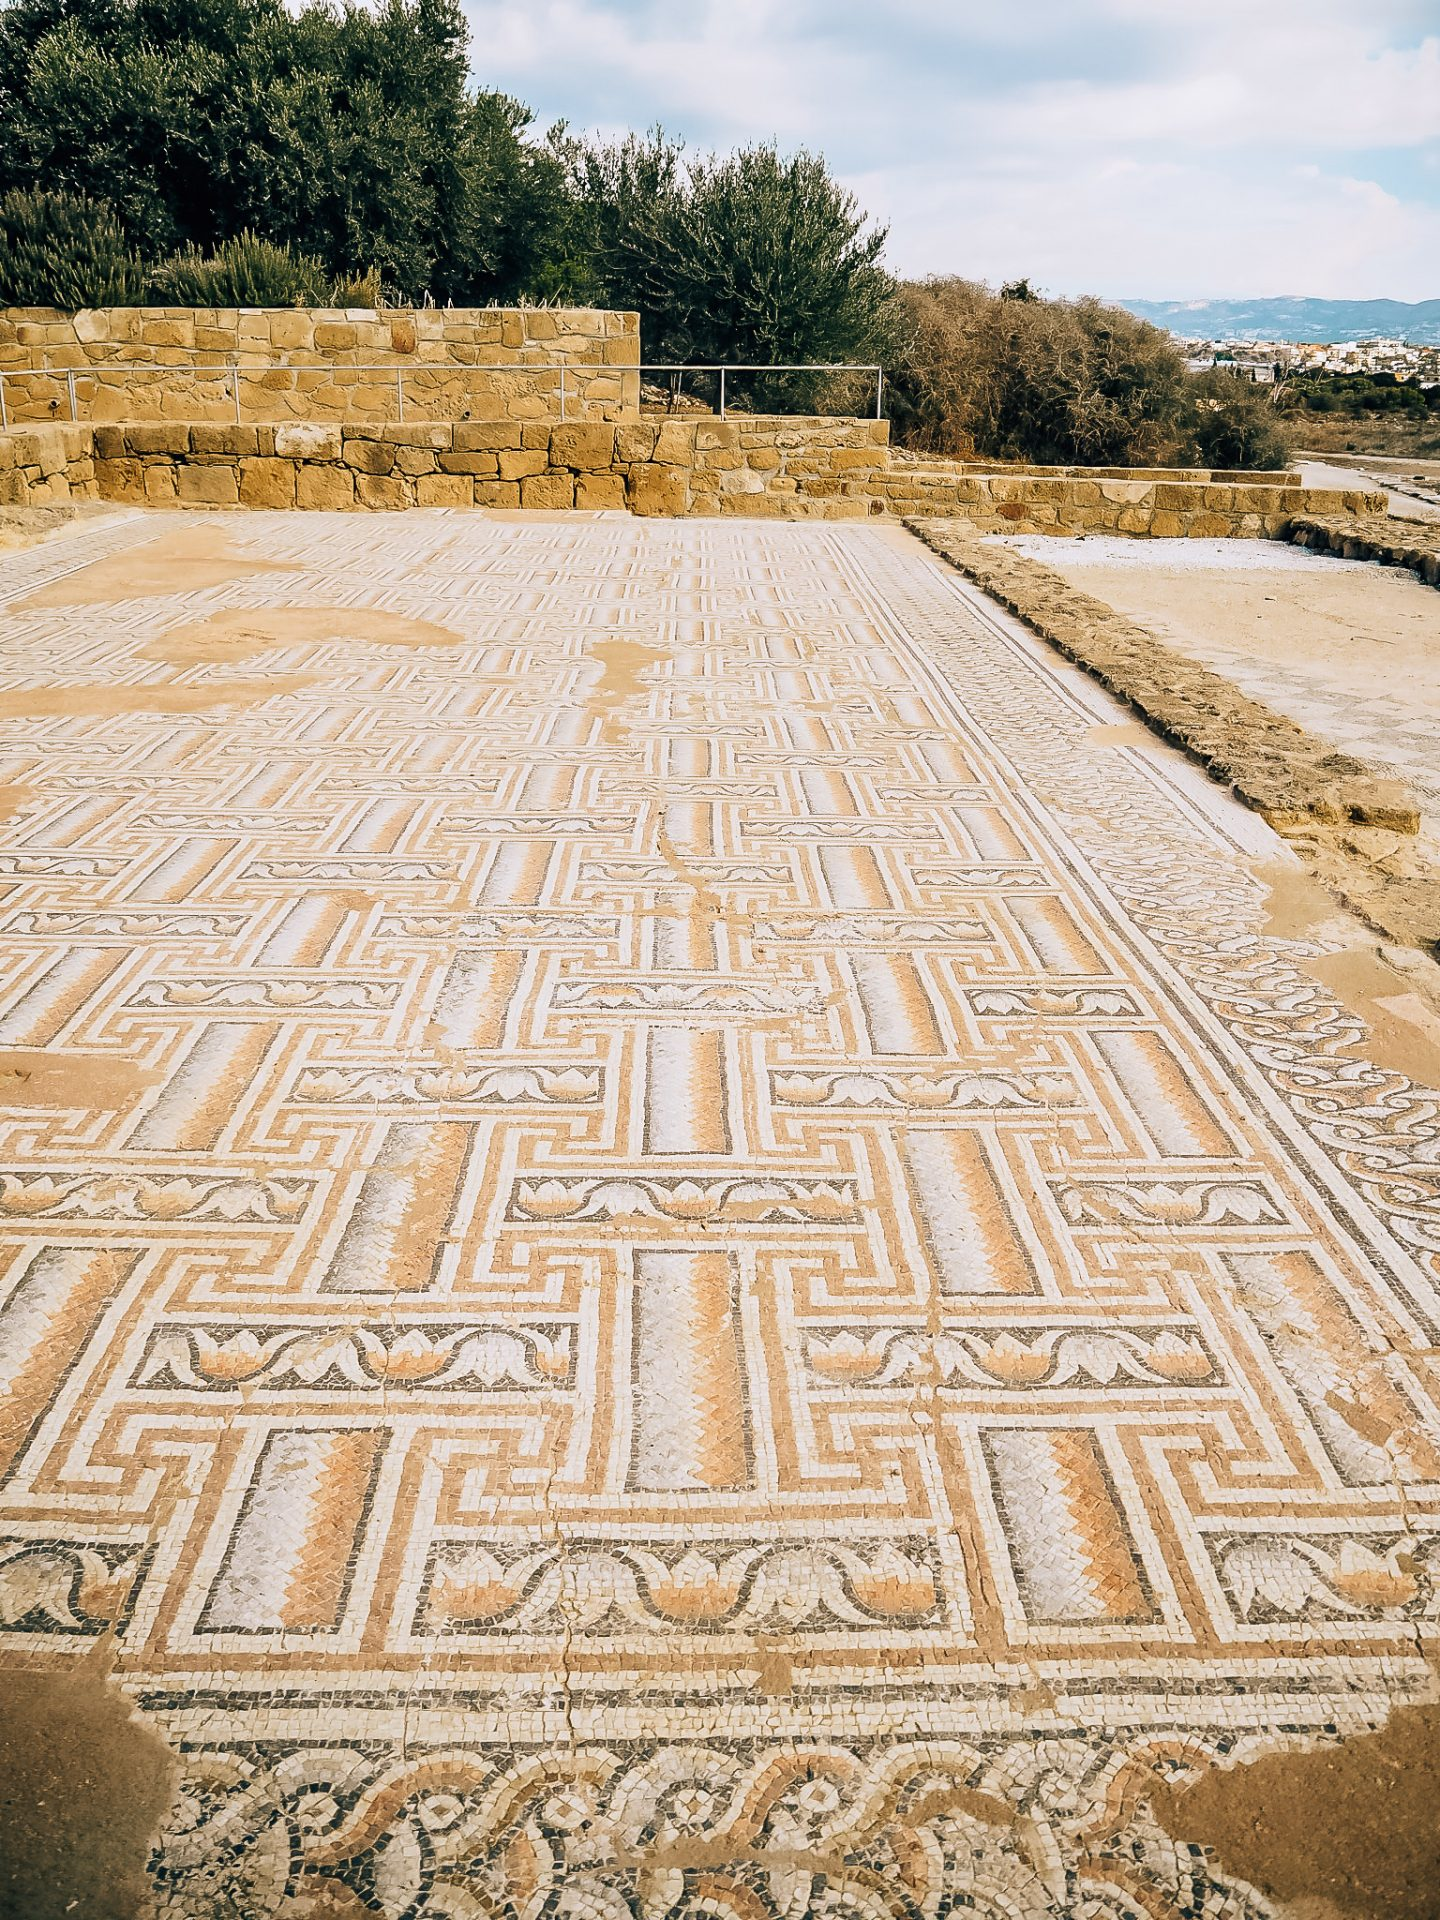 Paphos Mosaics in Paphos Cyprus